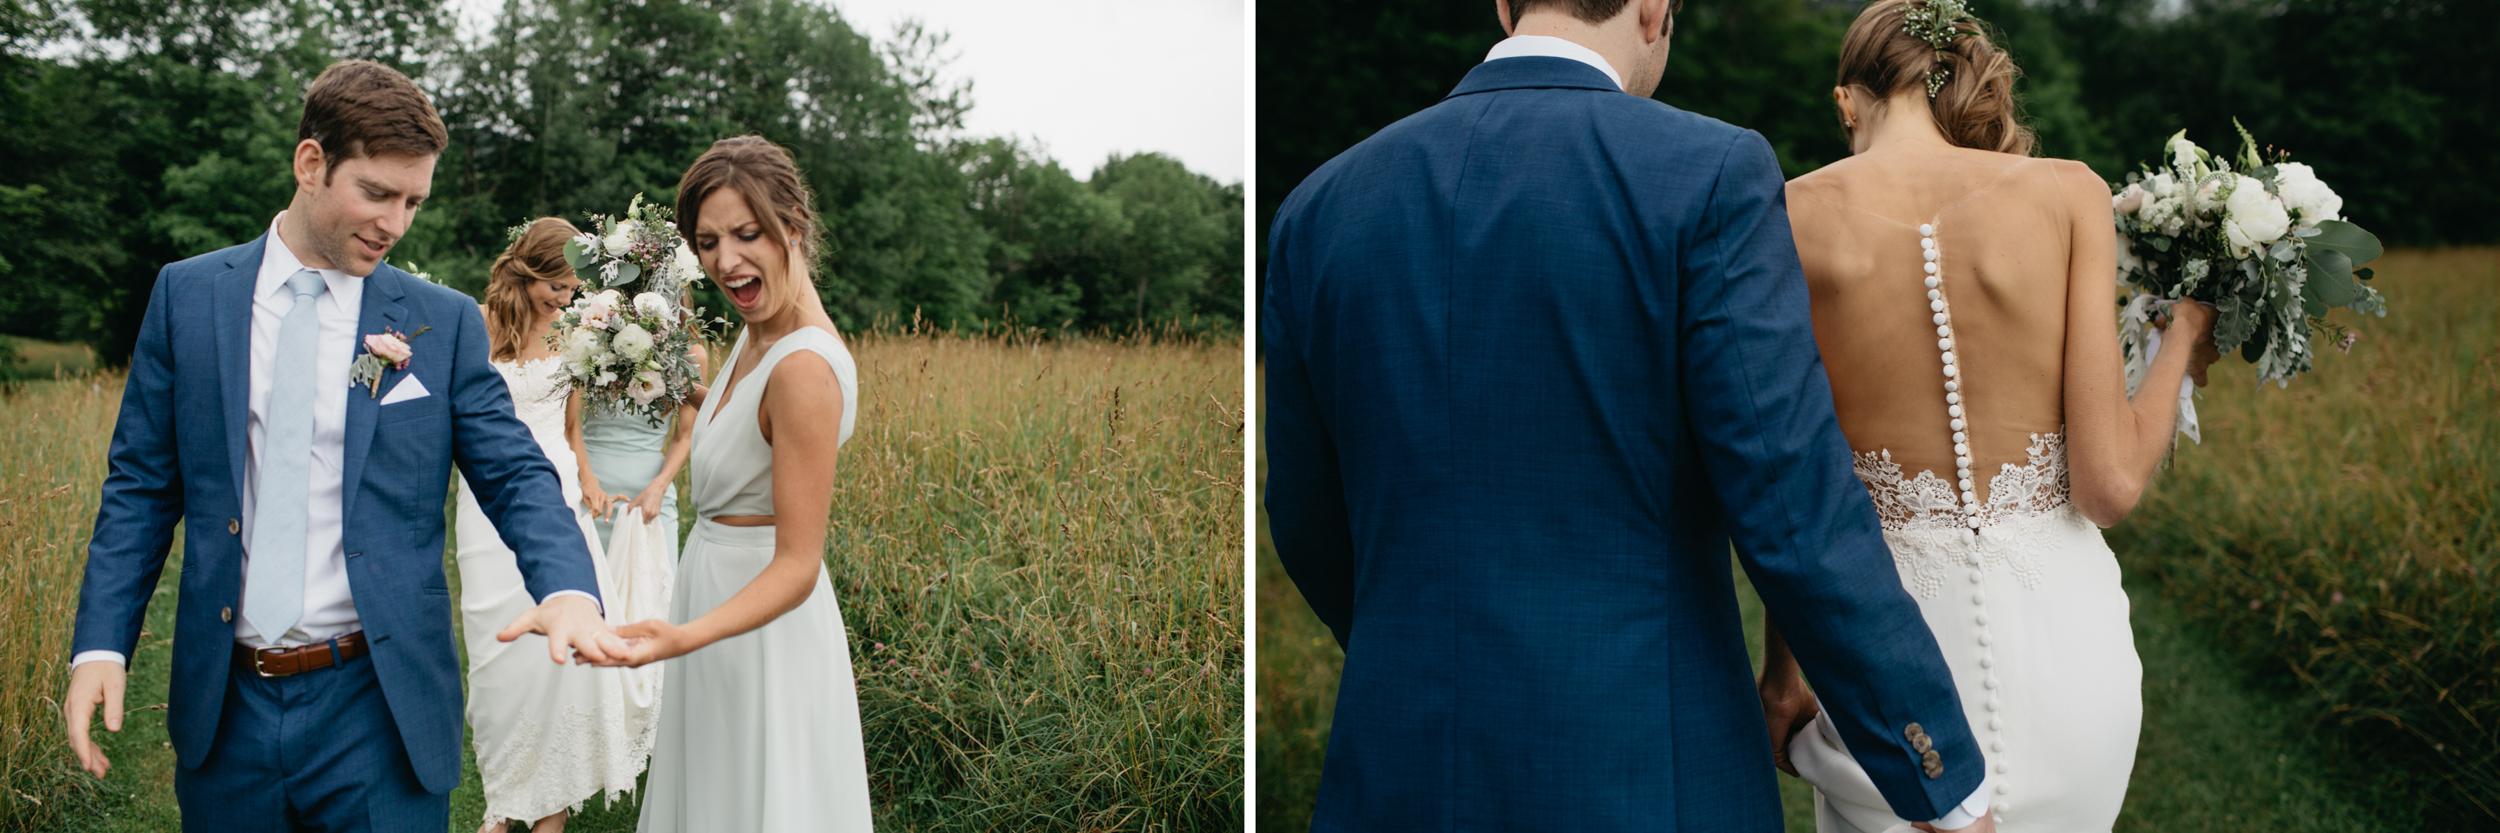 Karen_Alex_Bliss_ridge_farm_Vermont_wedding019.jpg